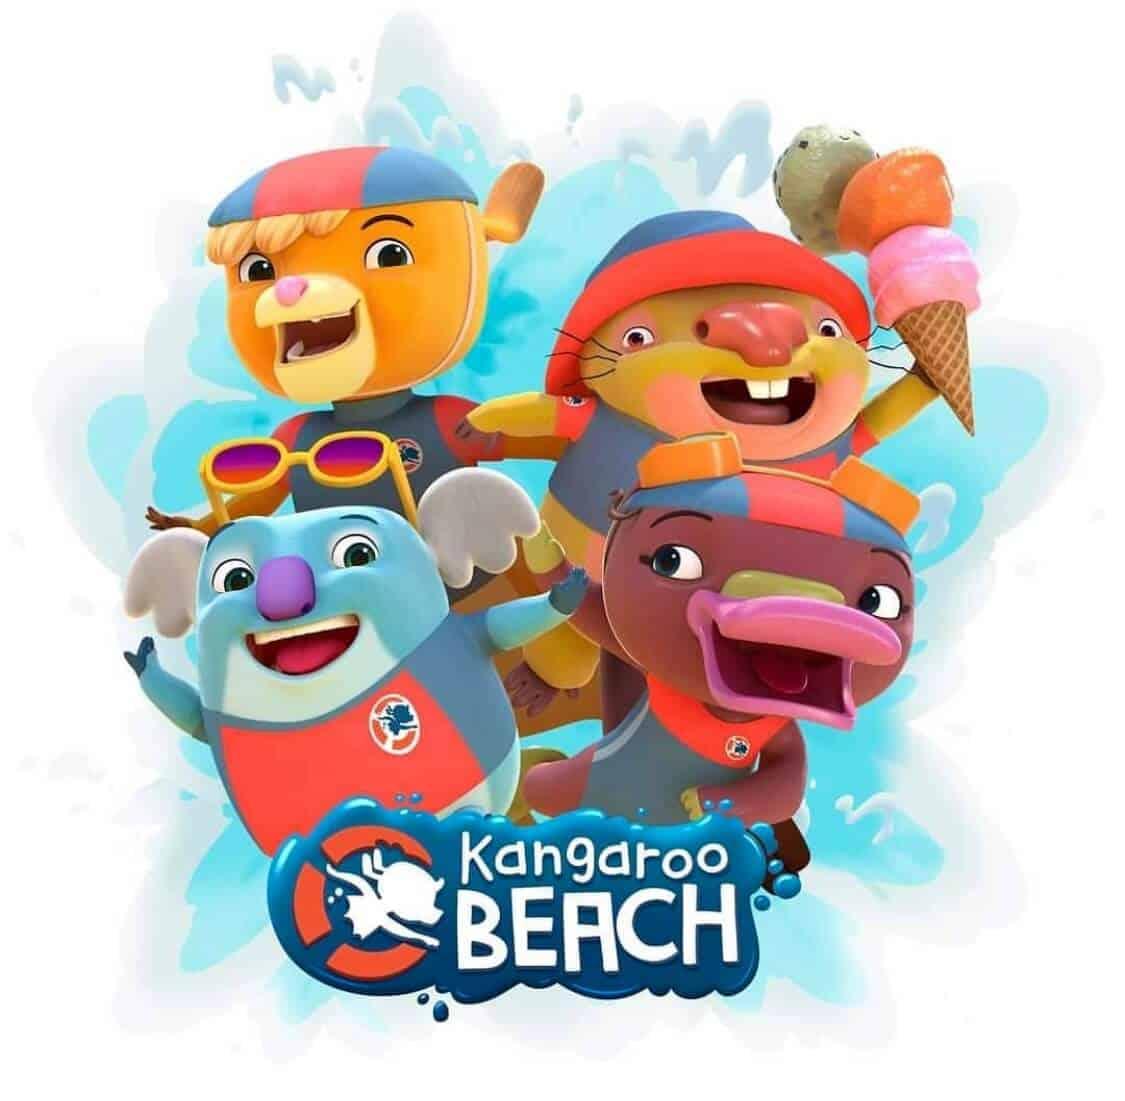 kangaroo beach characters